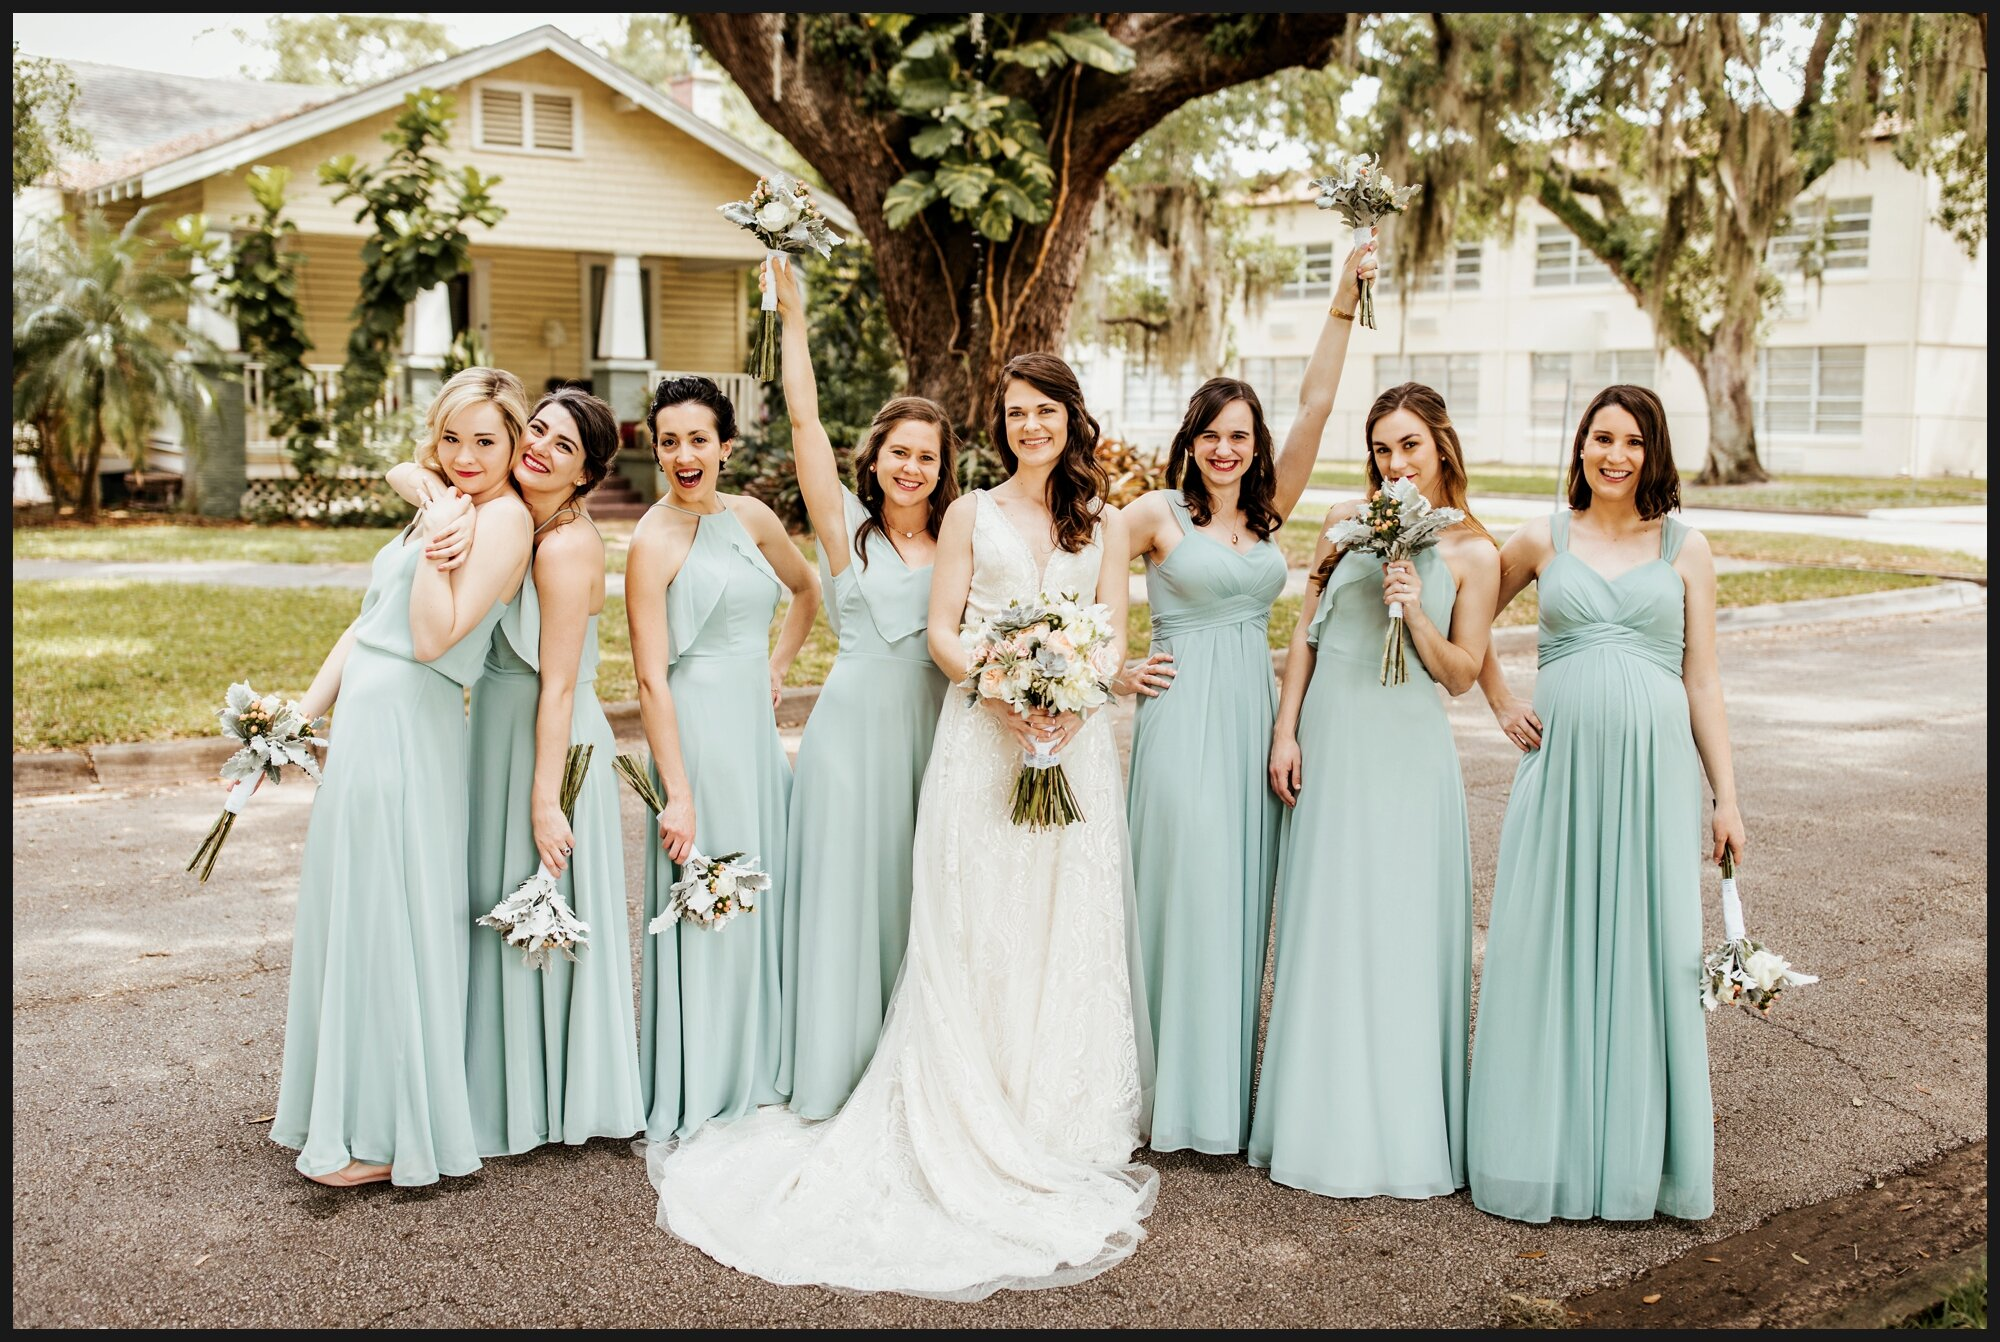 Orlando-Wedding-Photographer-destination-wedding-photographer-florida-wedding-photographer-hawaii-wedding-photographer_0662.jpg